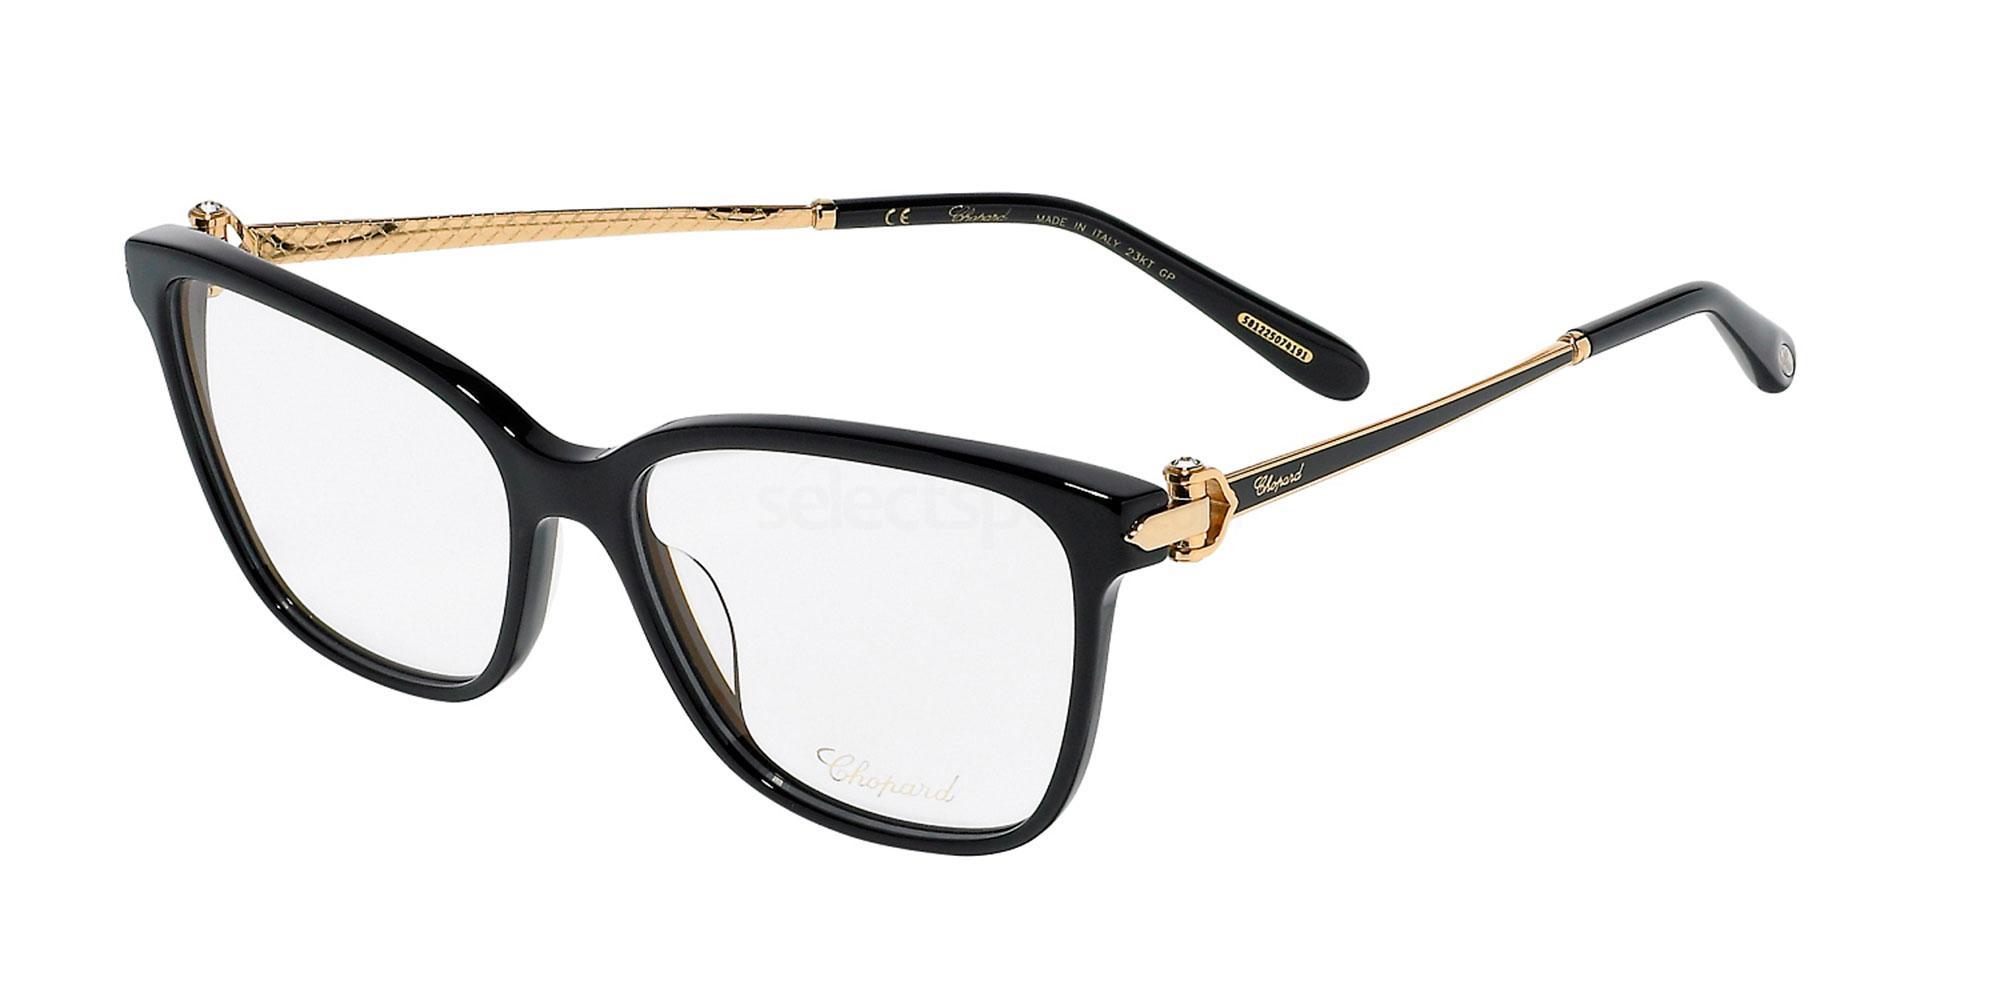 0700 VCH246S Glasses, Chopard